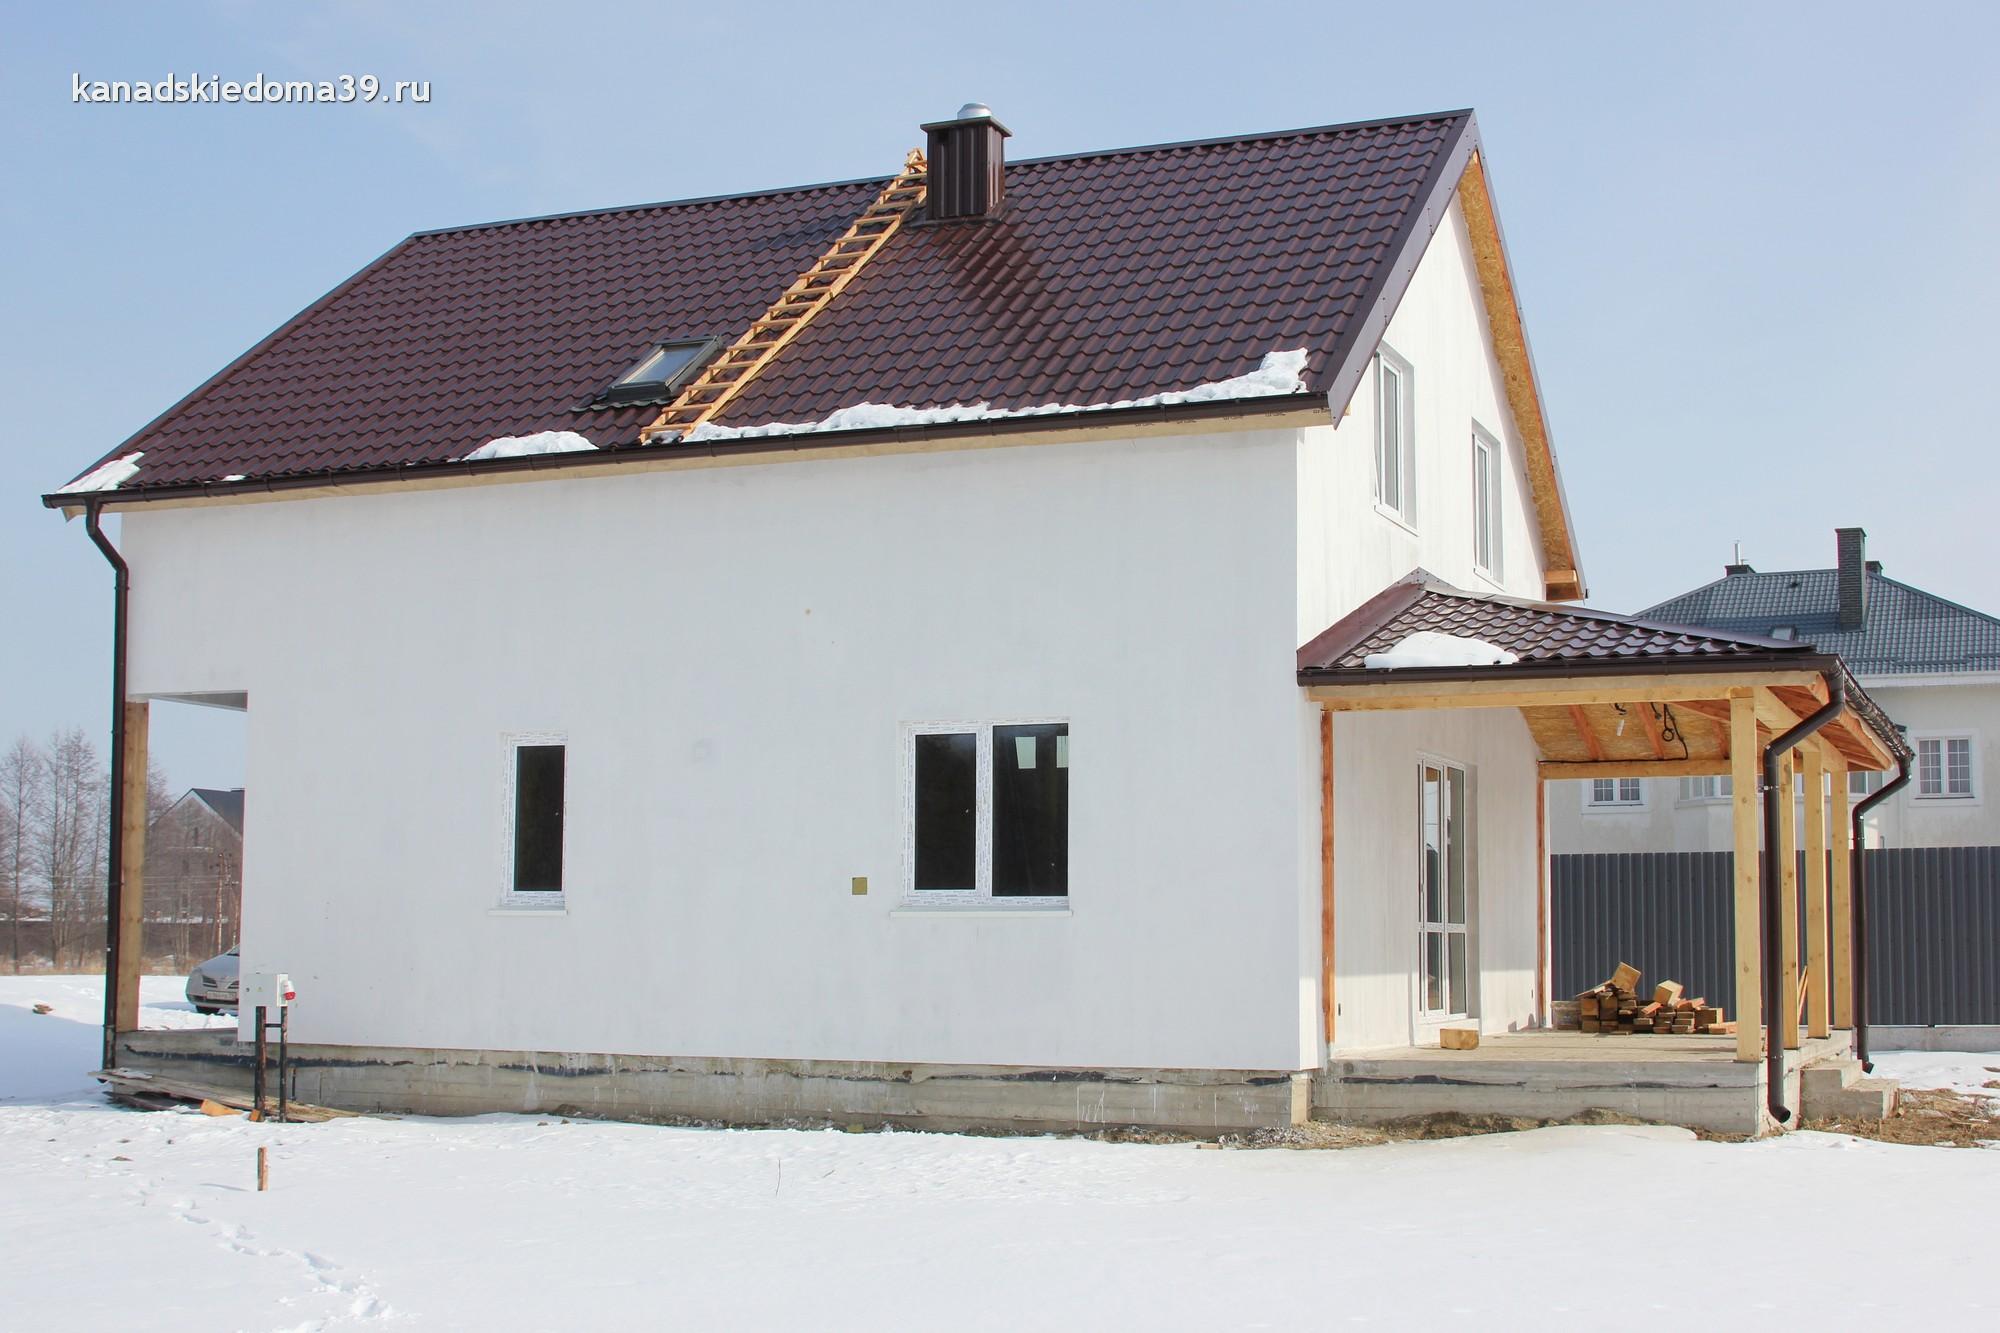 kanadskie-doma-sip-kovrovo006